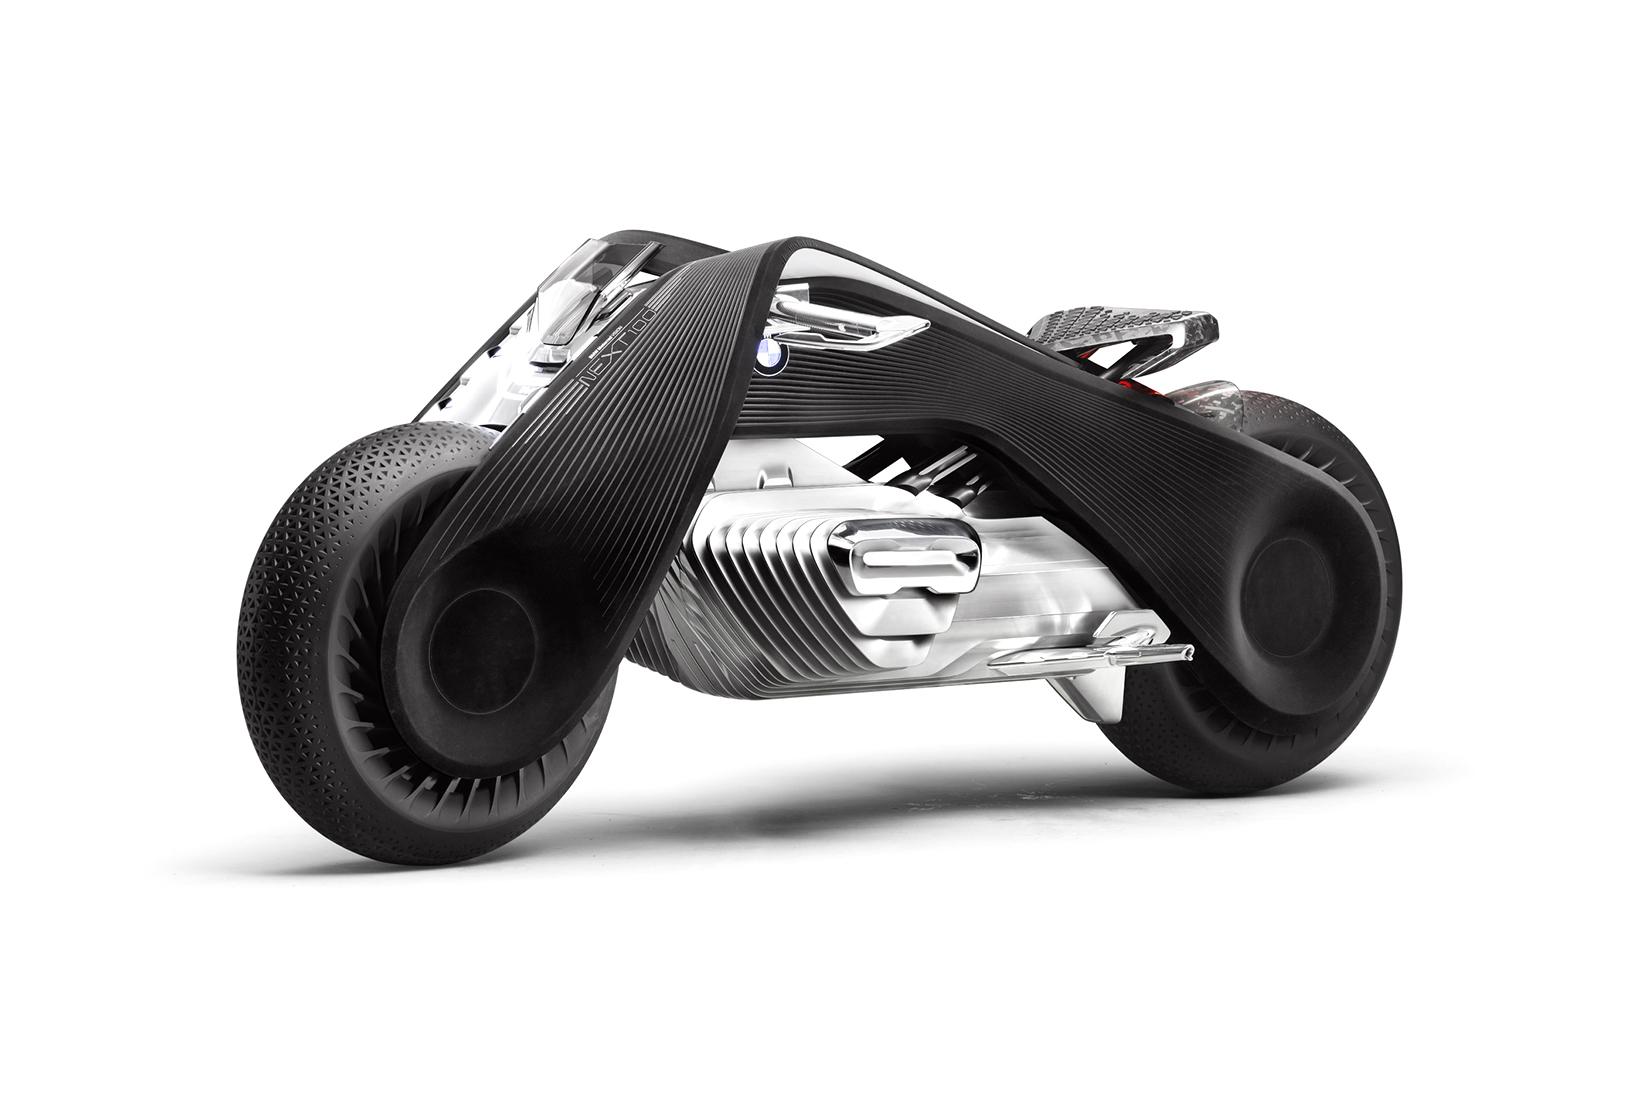 Bmw Logo Black >> BMW Motorrad Vision Next 100 Concept   HYPEBEAST